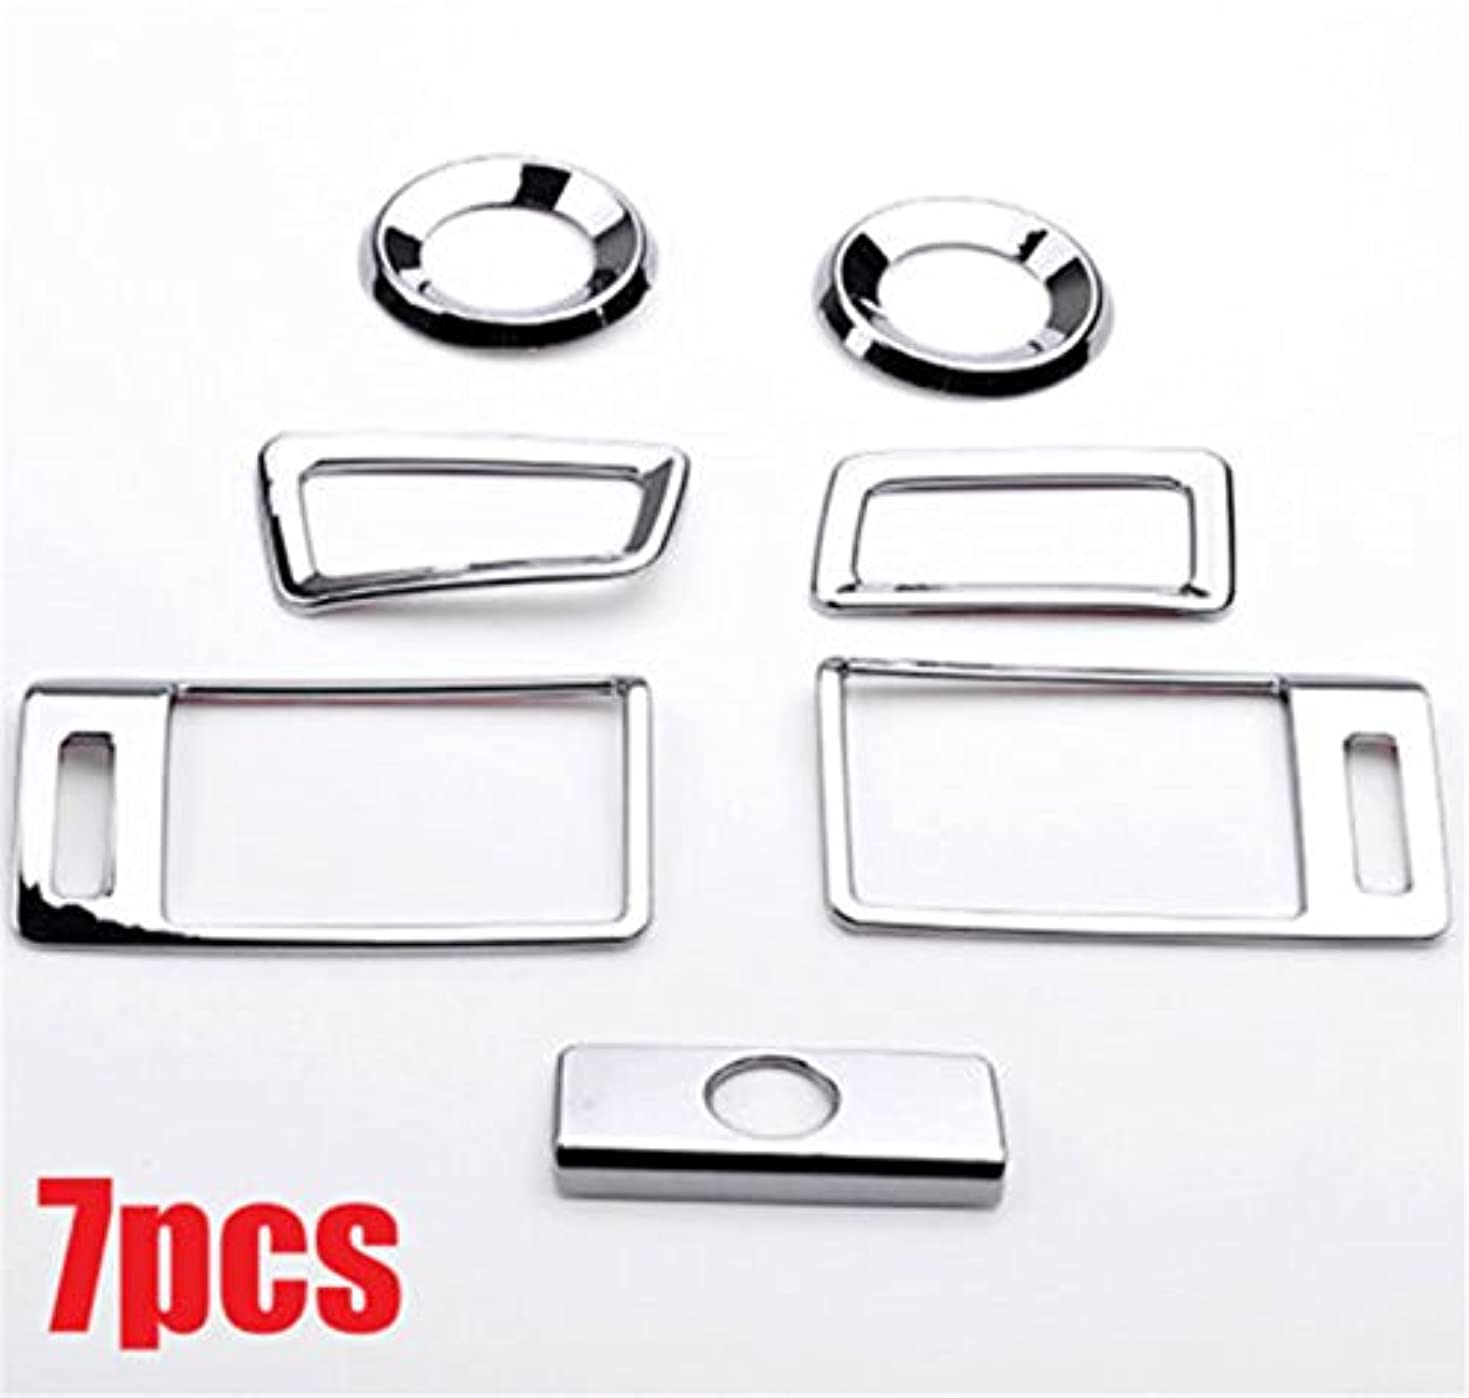 Jicorzo - 7pcs Car Air Vent Door Speaker Chrome Trim Cover Fit For Honda Accord 2013-2017 Bezel Car Interior Accessories Styling